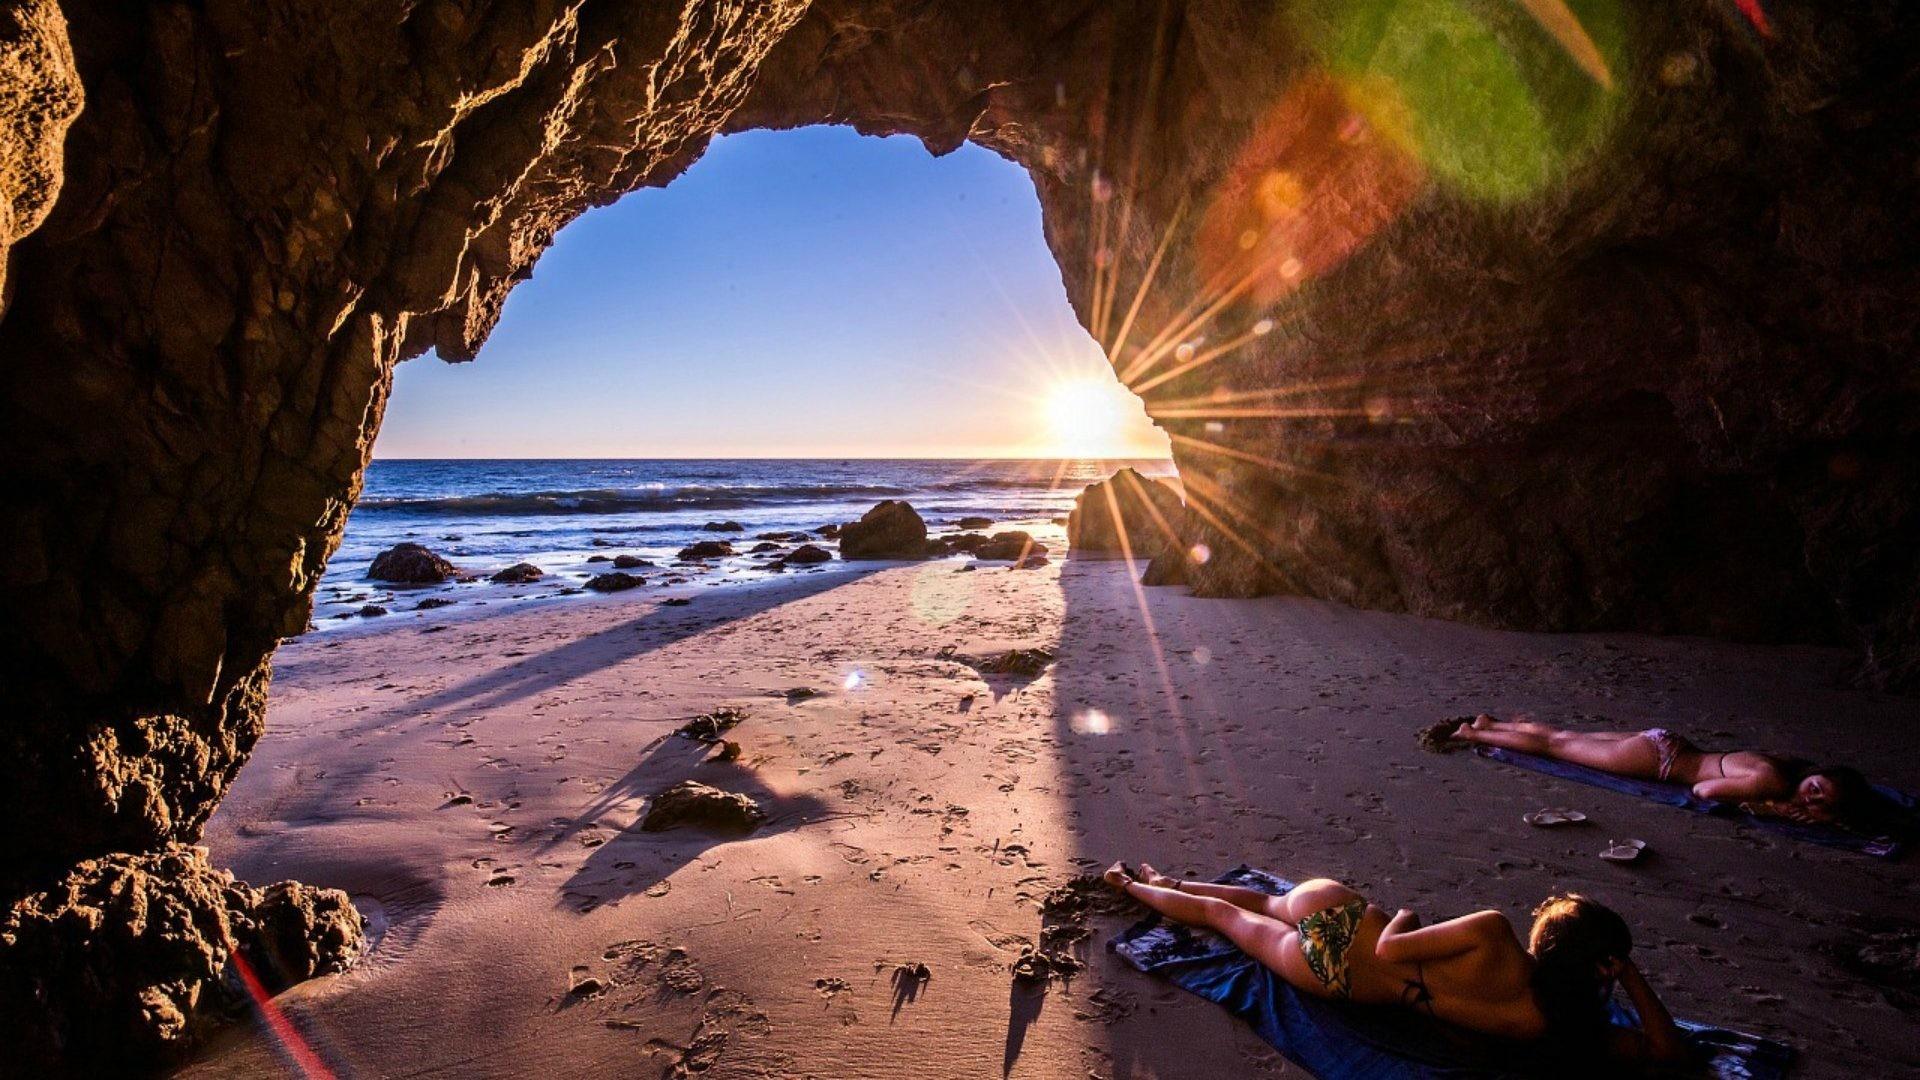 2560x1600 California Beaches Tumblr